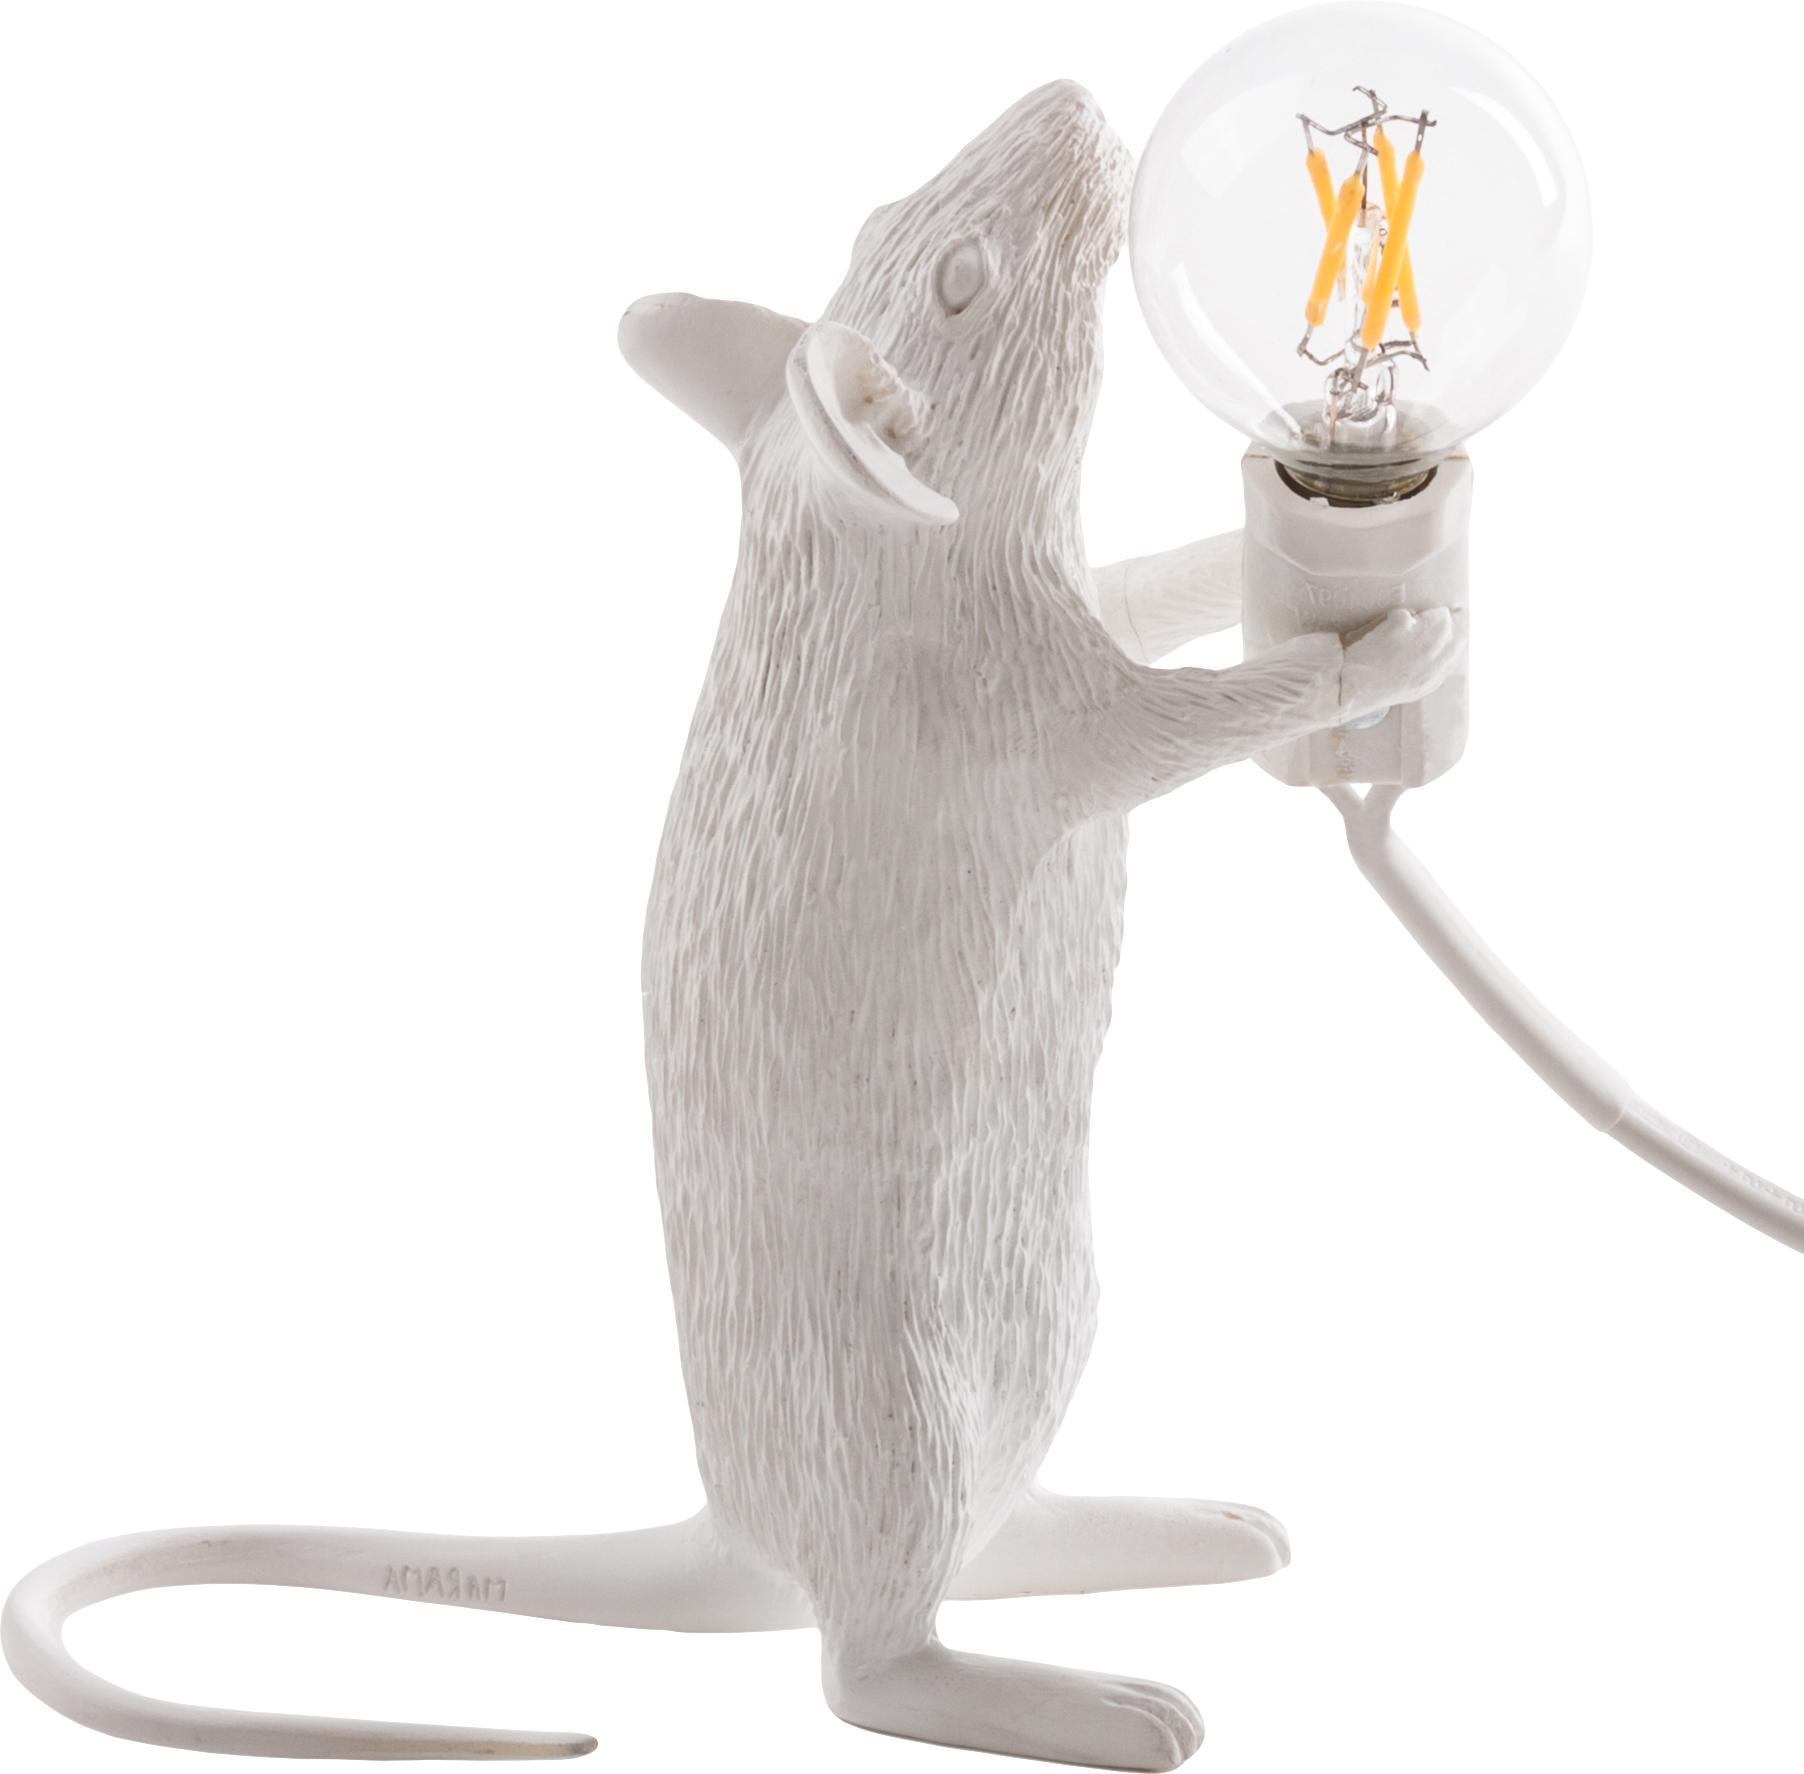 Design tafellamp Mouse, Kunsthars, Wit, 6 x 15 cm